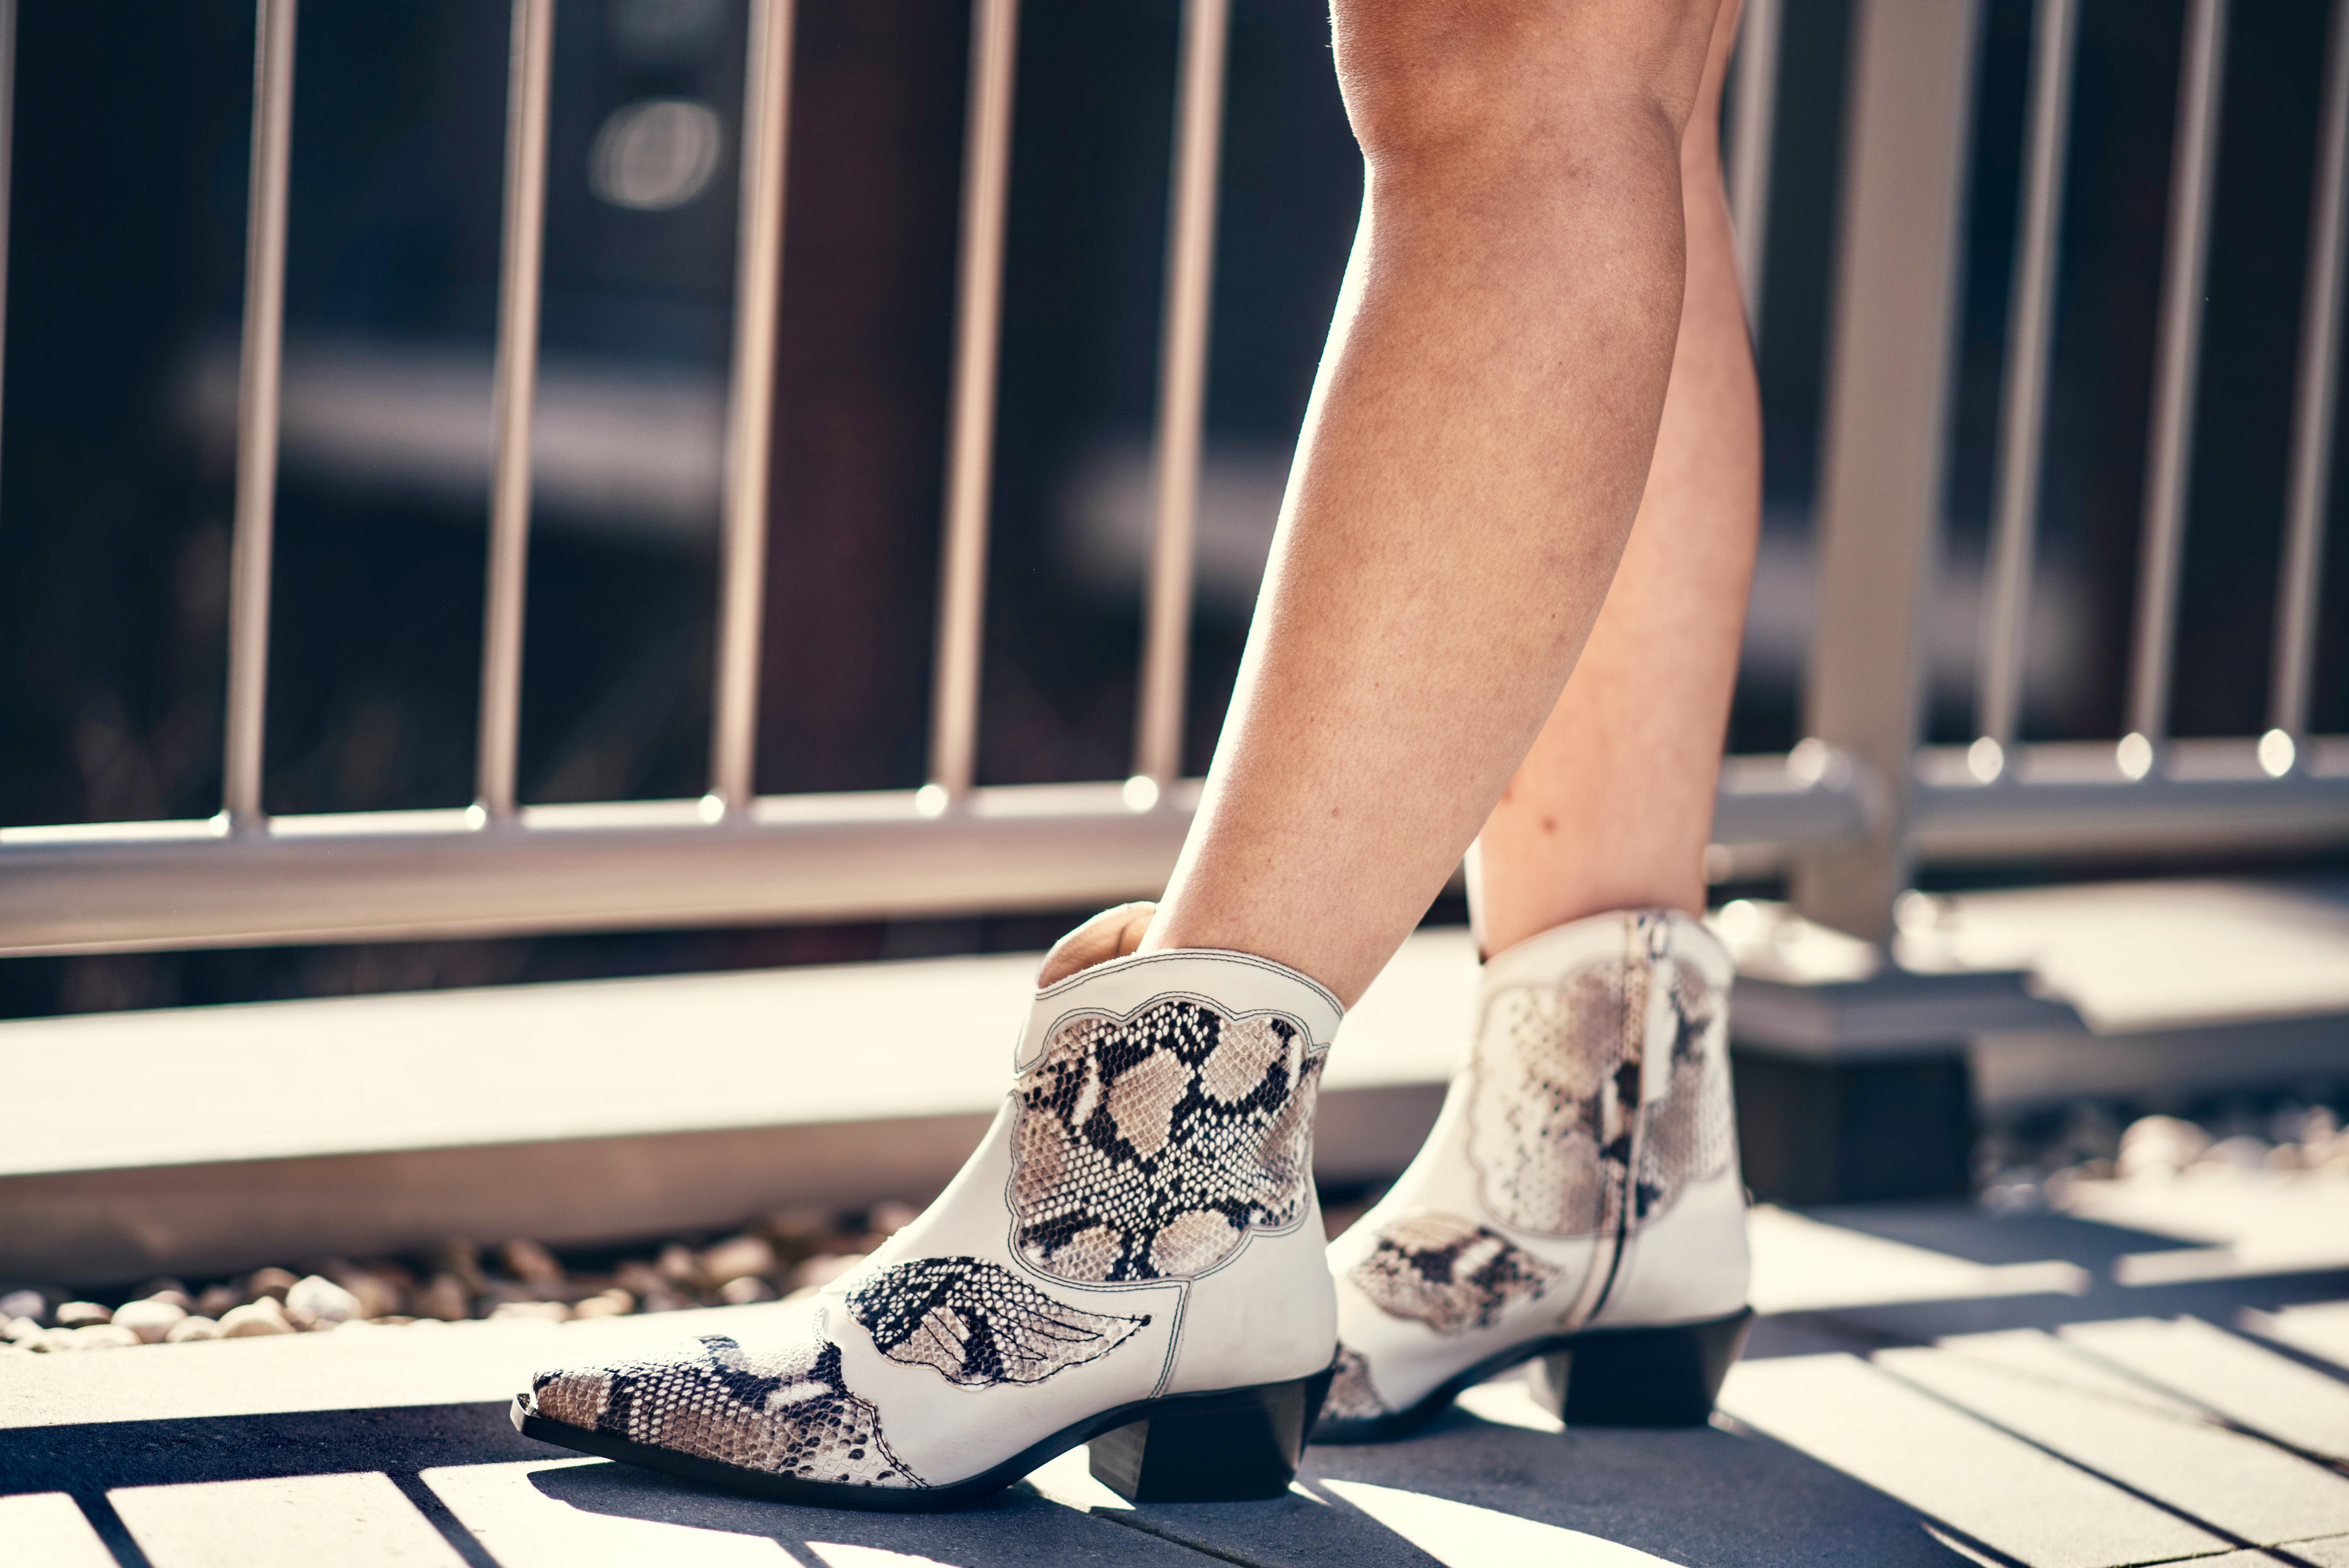 van den assem, assem, boots, vowboy, country, cowboyboots, cowboy boots, trend, zomer, voorjaar, lente, ss19, seizoen, ootd, shoppen, laarzen, laarsjes